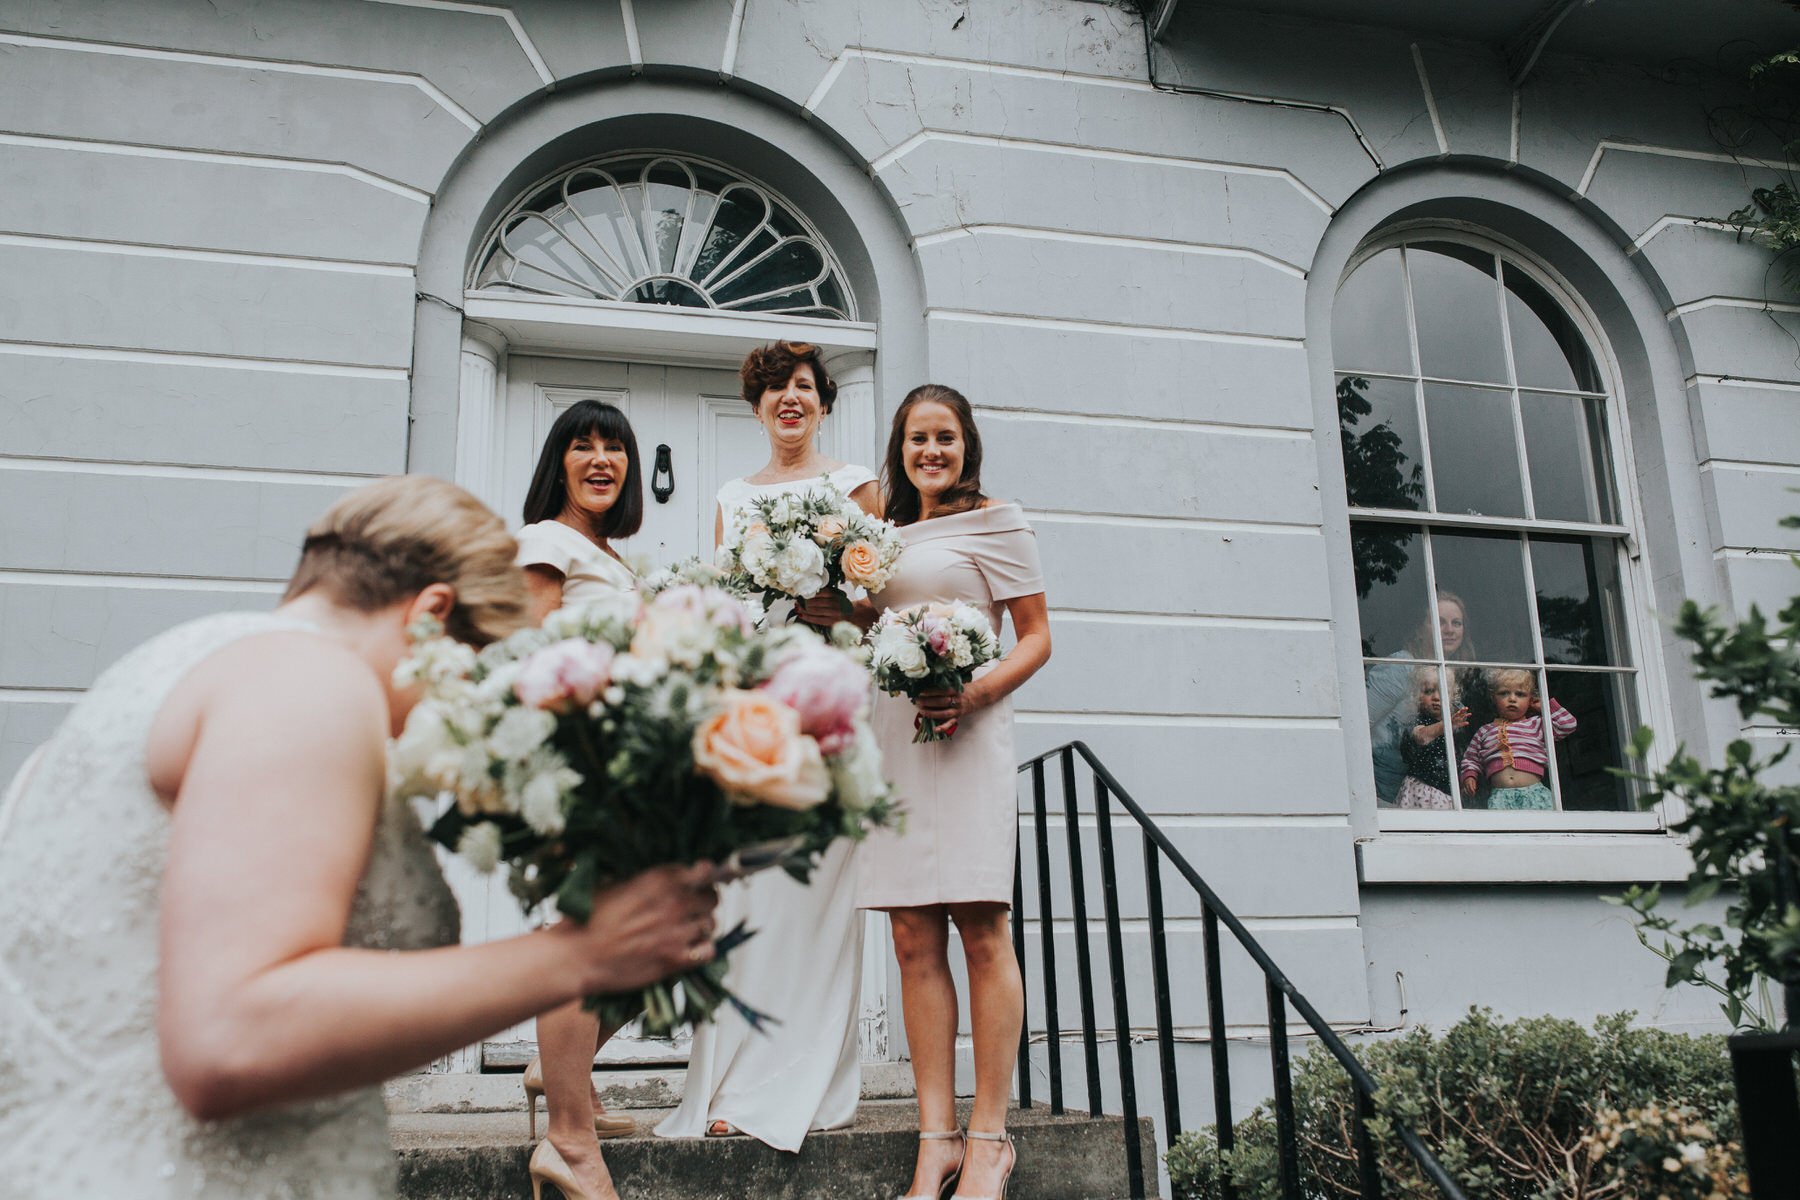 72 Islington reportage wedding photographer neighbours peeking window.jpg